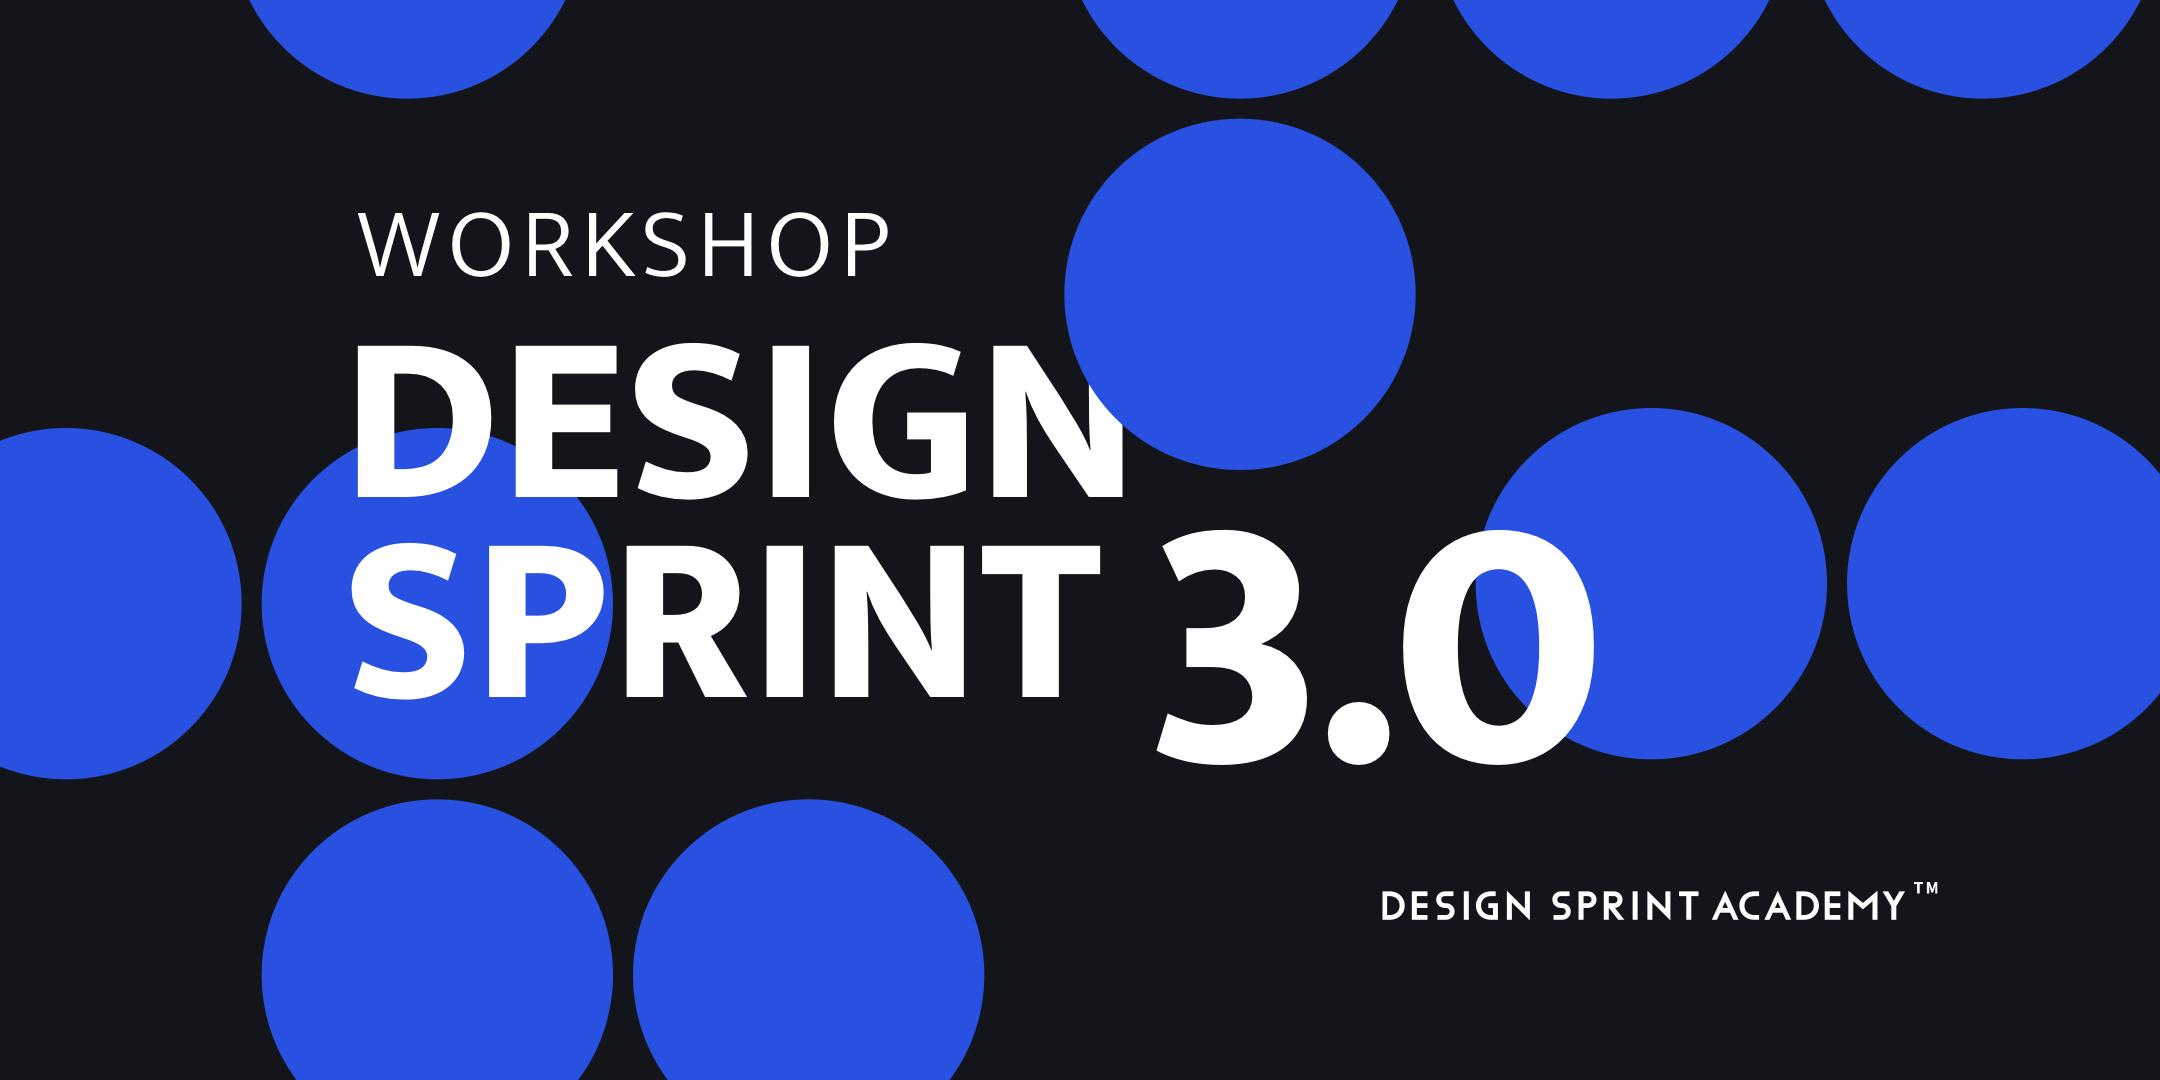 Design Sprint 3.0